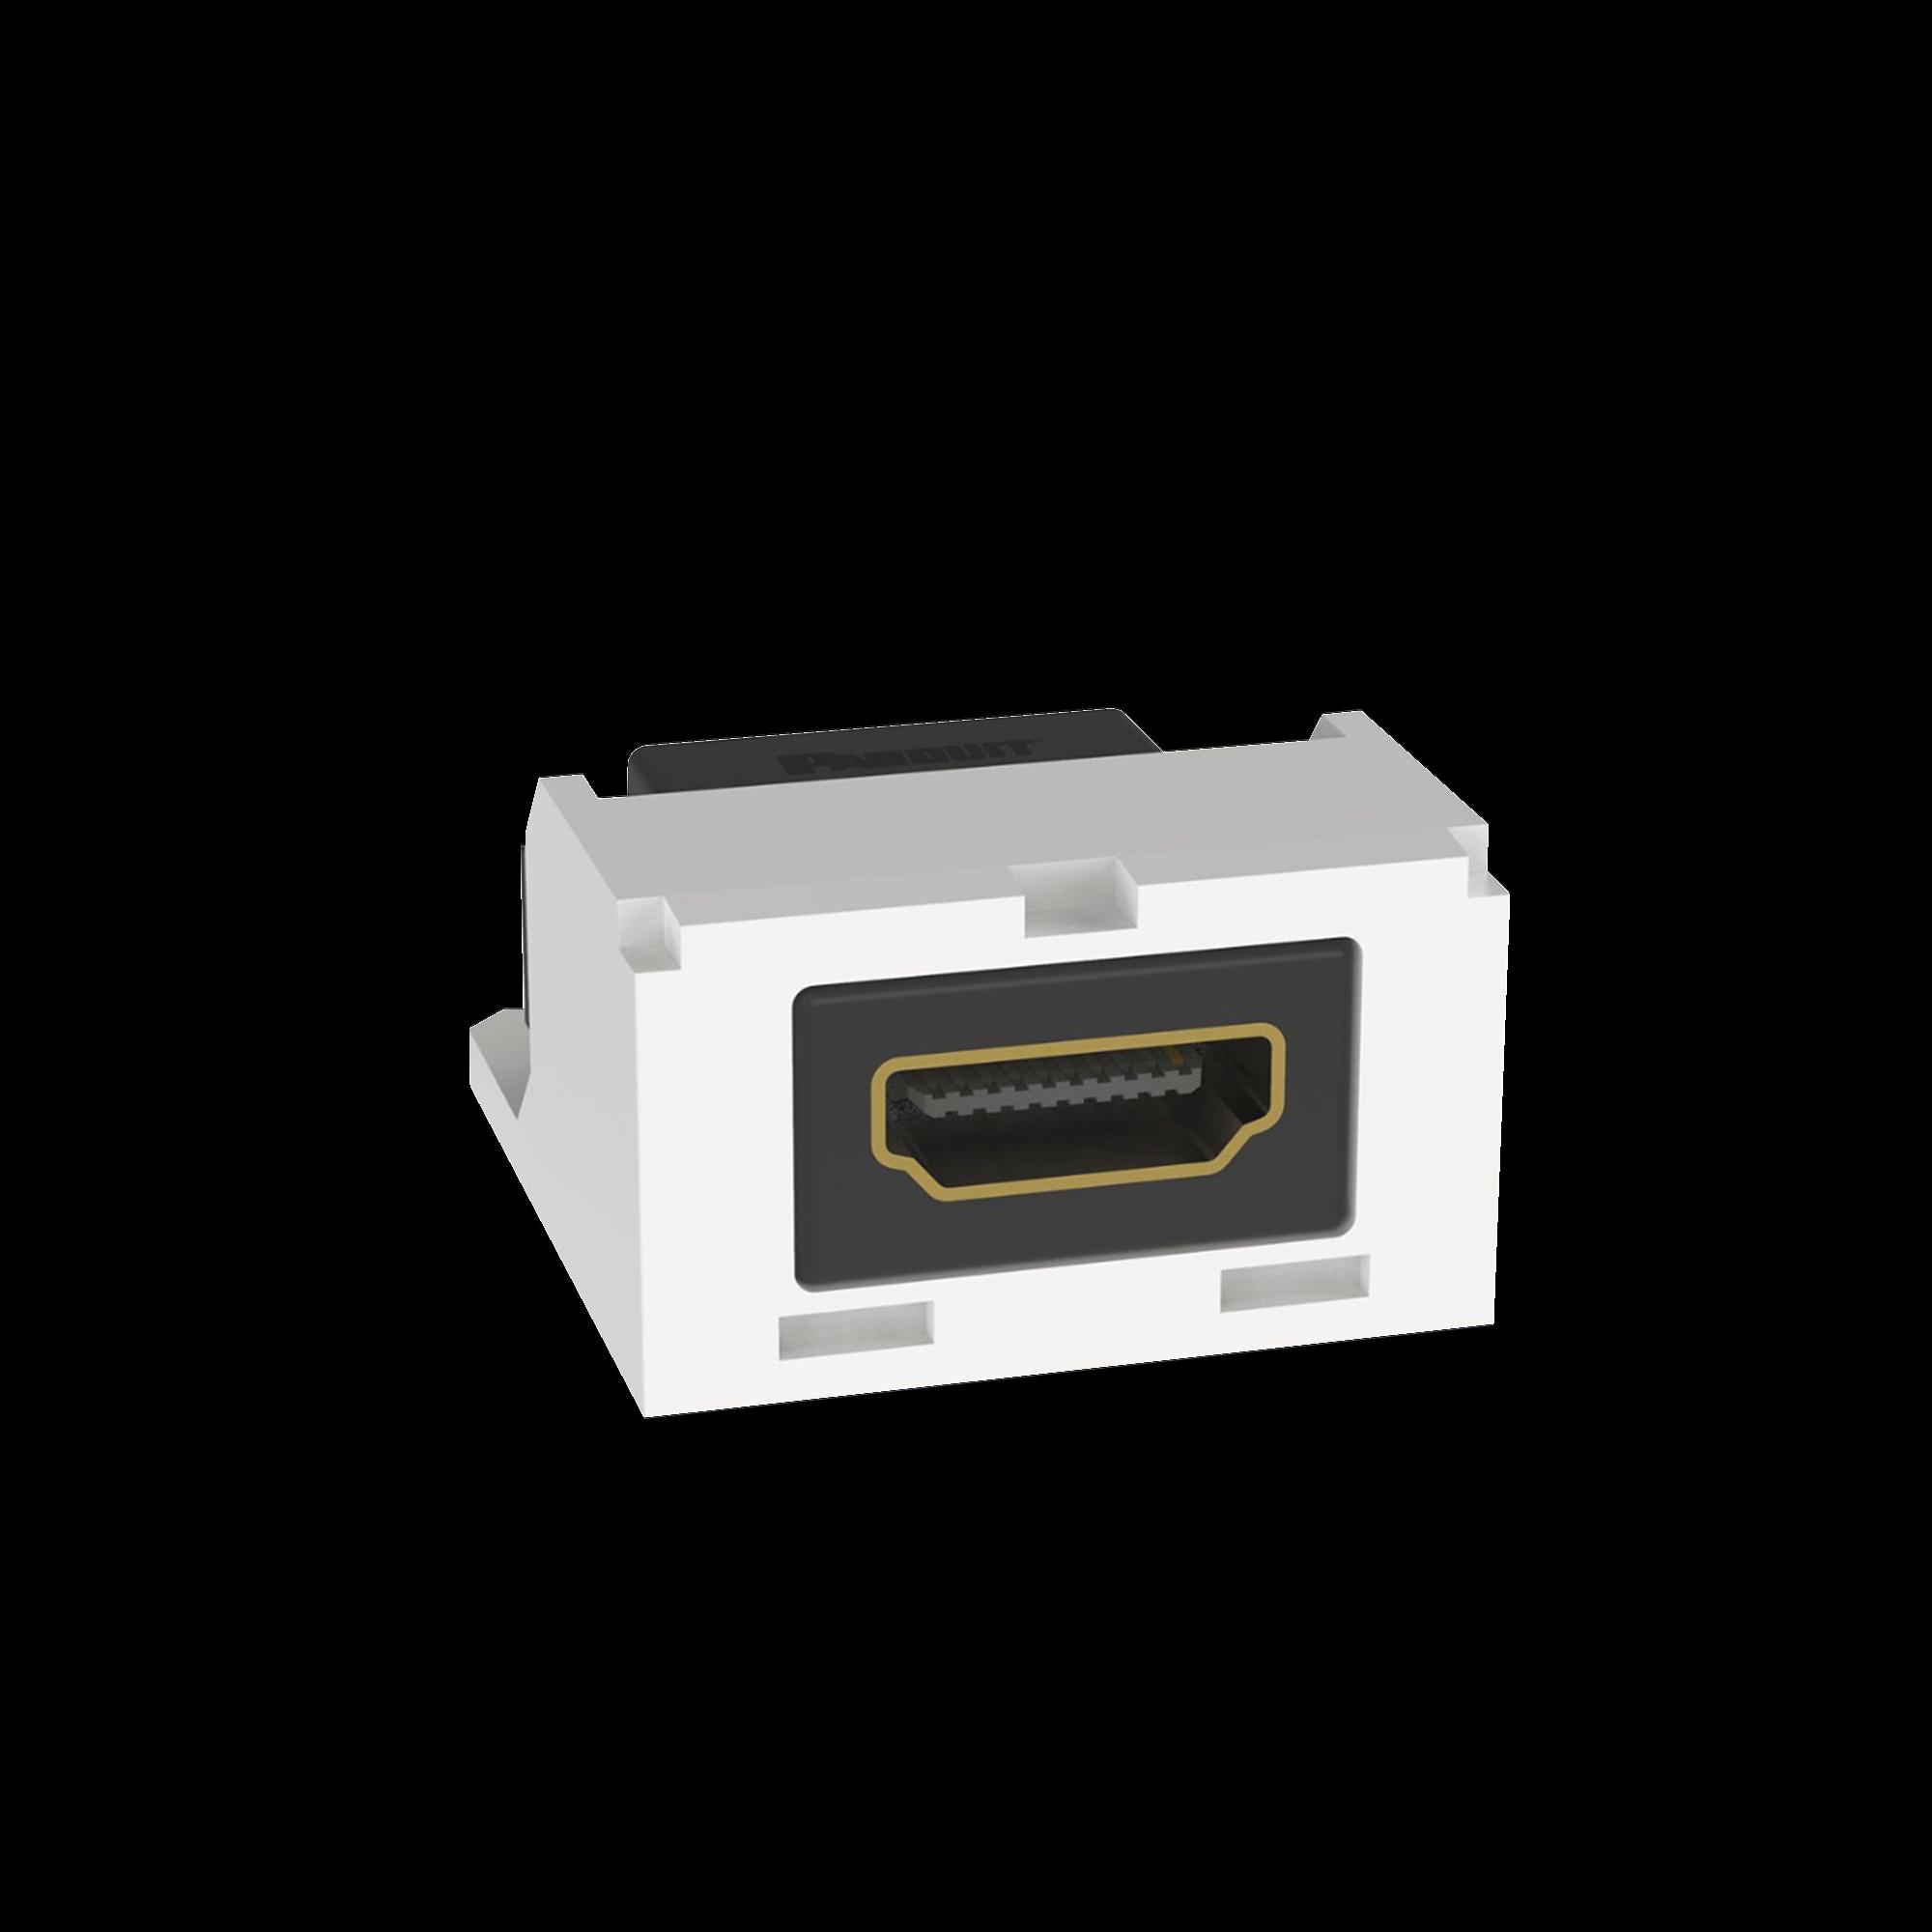 Modulo Acoplador HDMI 2.0, Hembra a Hembra Tipo-A, Categoria 2, Mini-Com, Color Blanco ártico